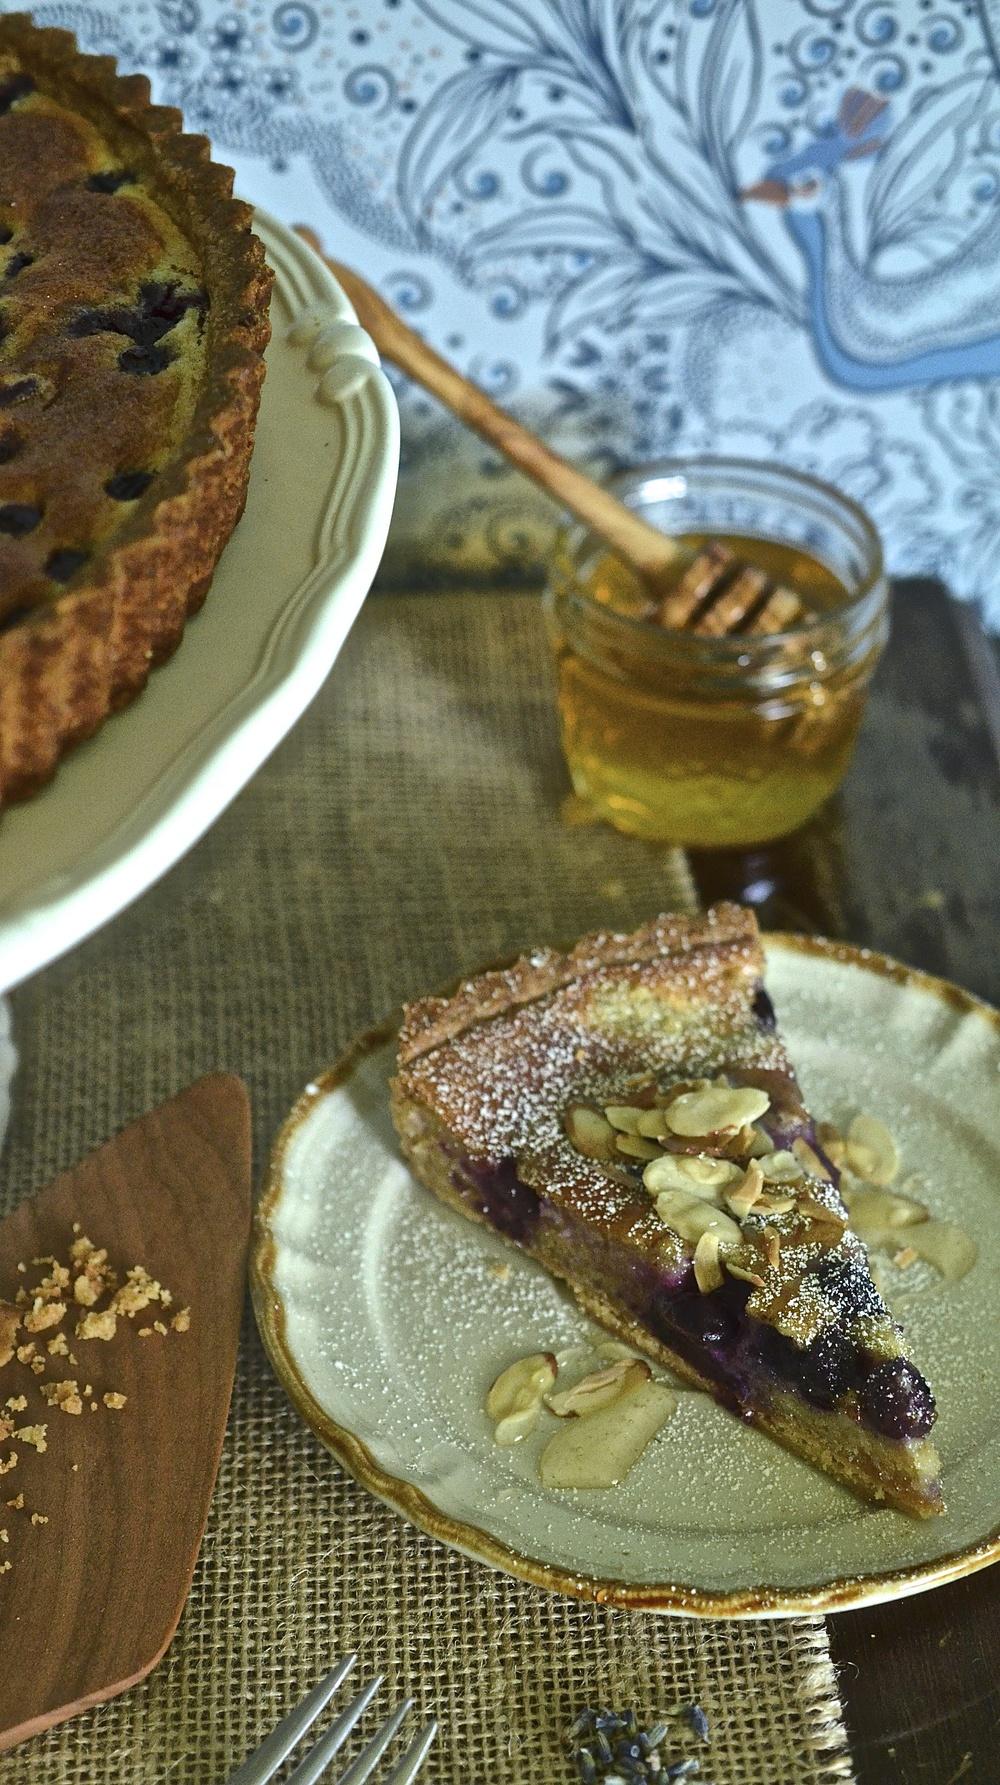 Blueberry lemon and lavenderFrangipane